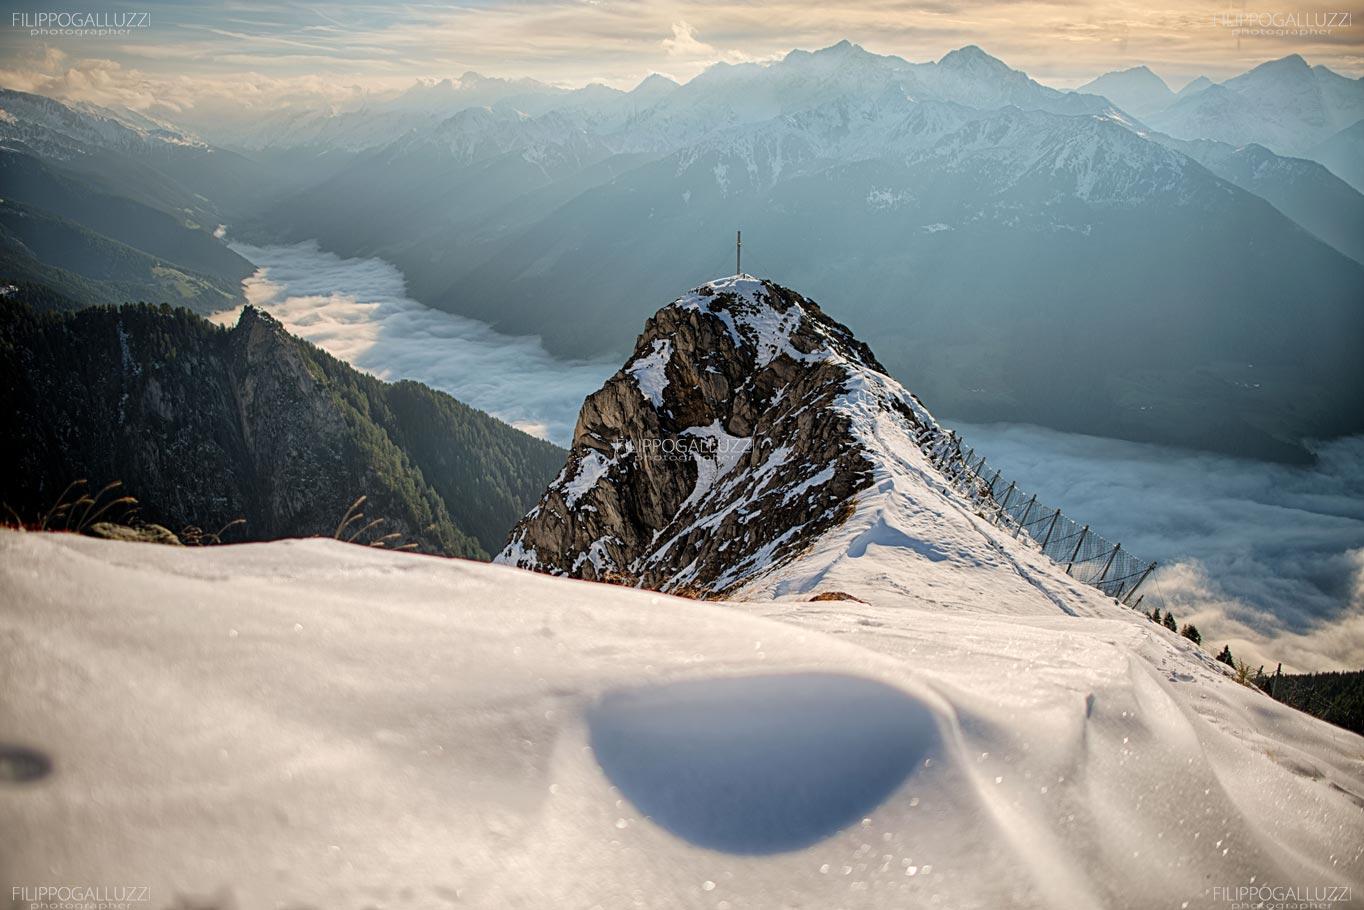 Aldto Adige, La valle Aurina dal monte schoenberg